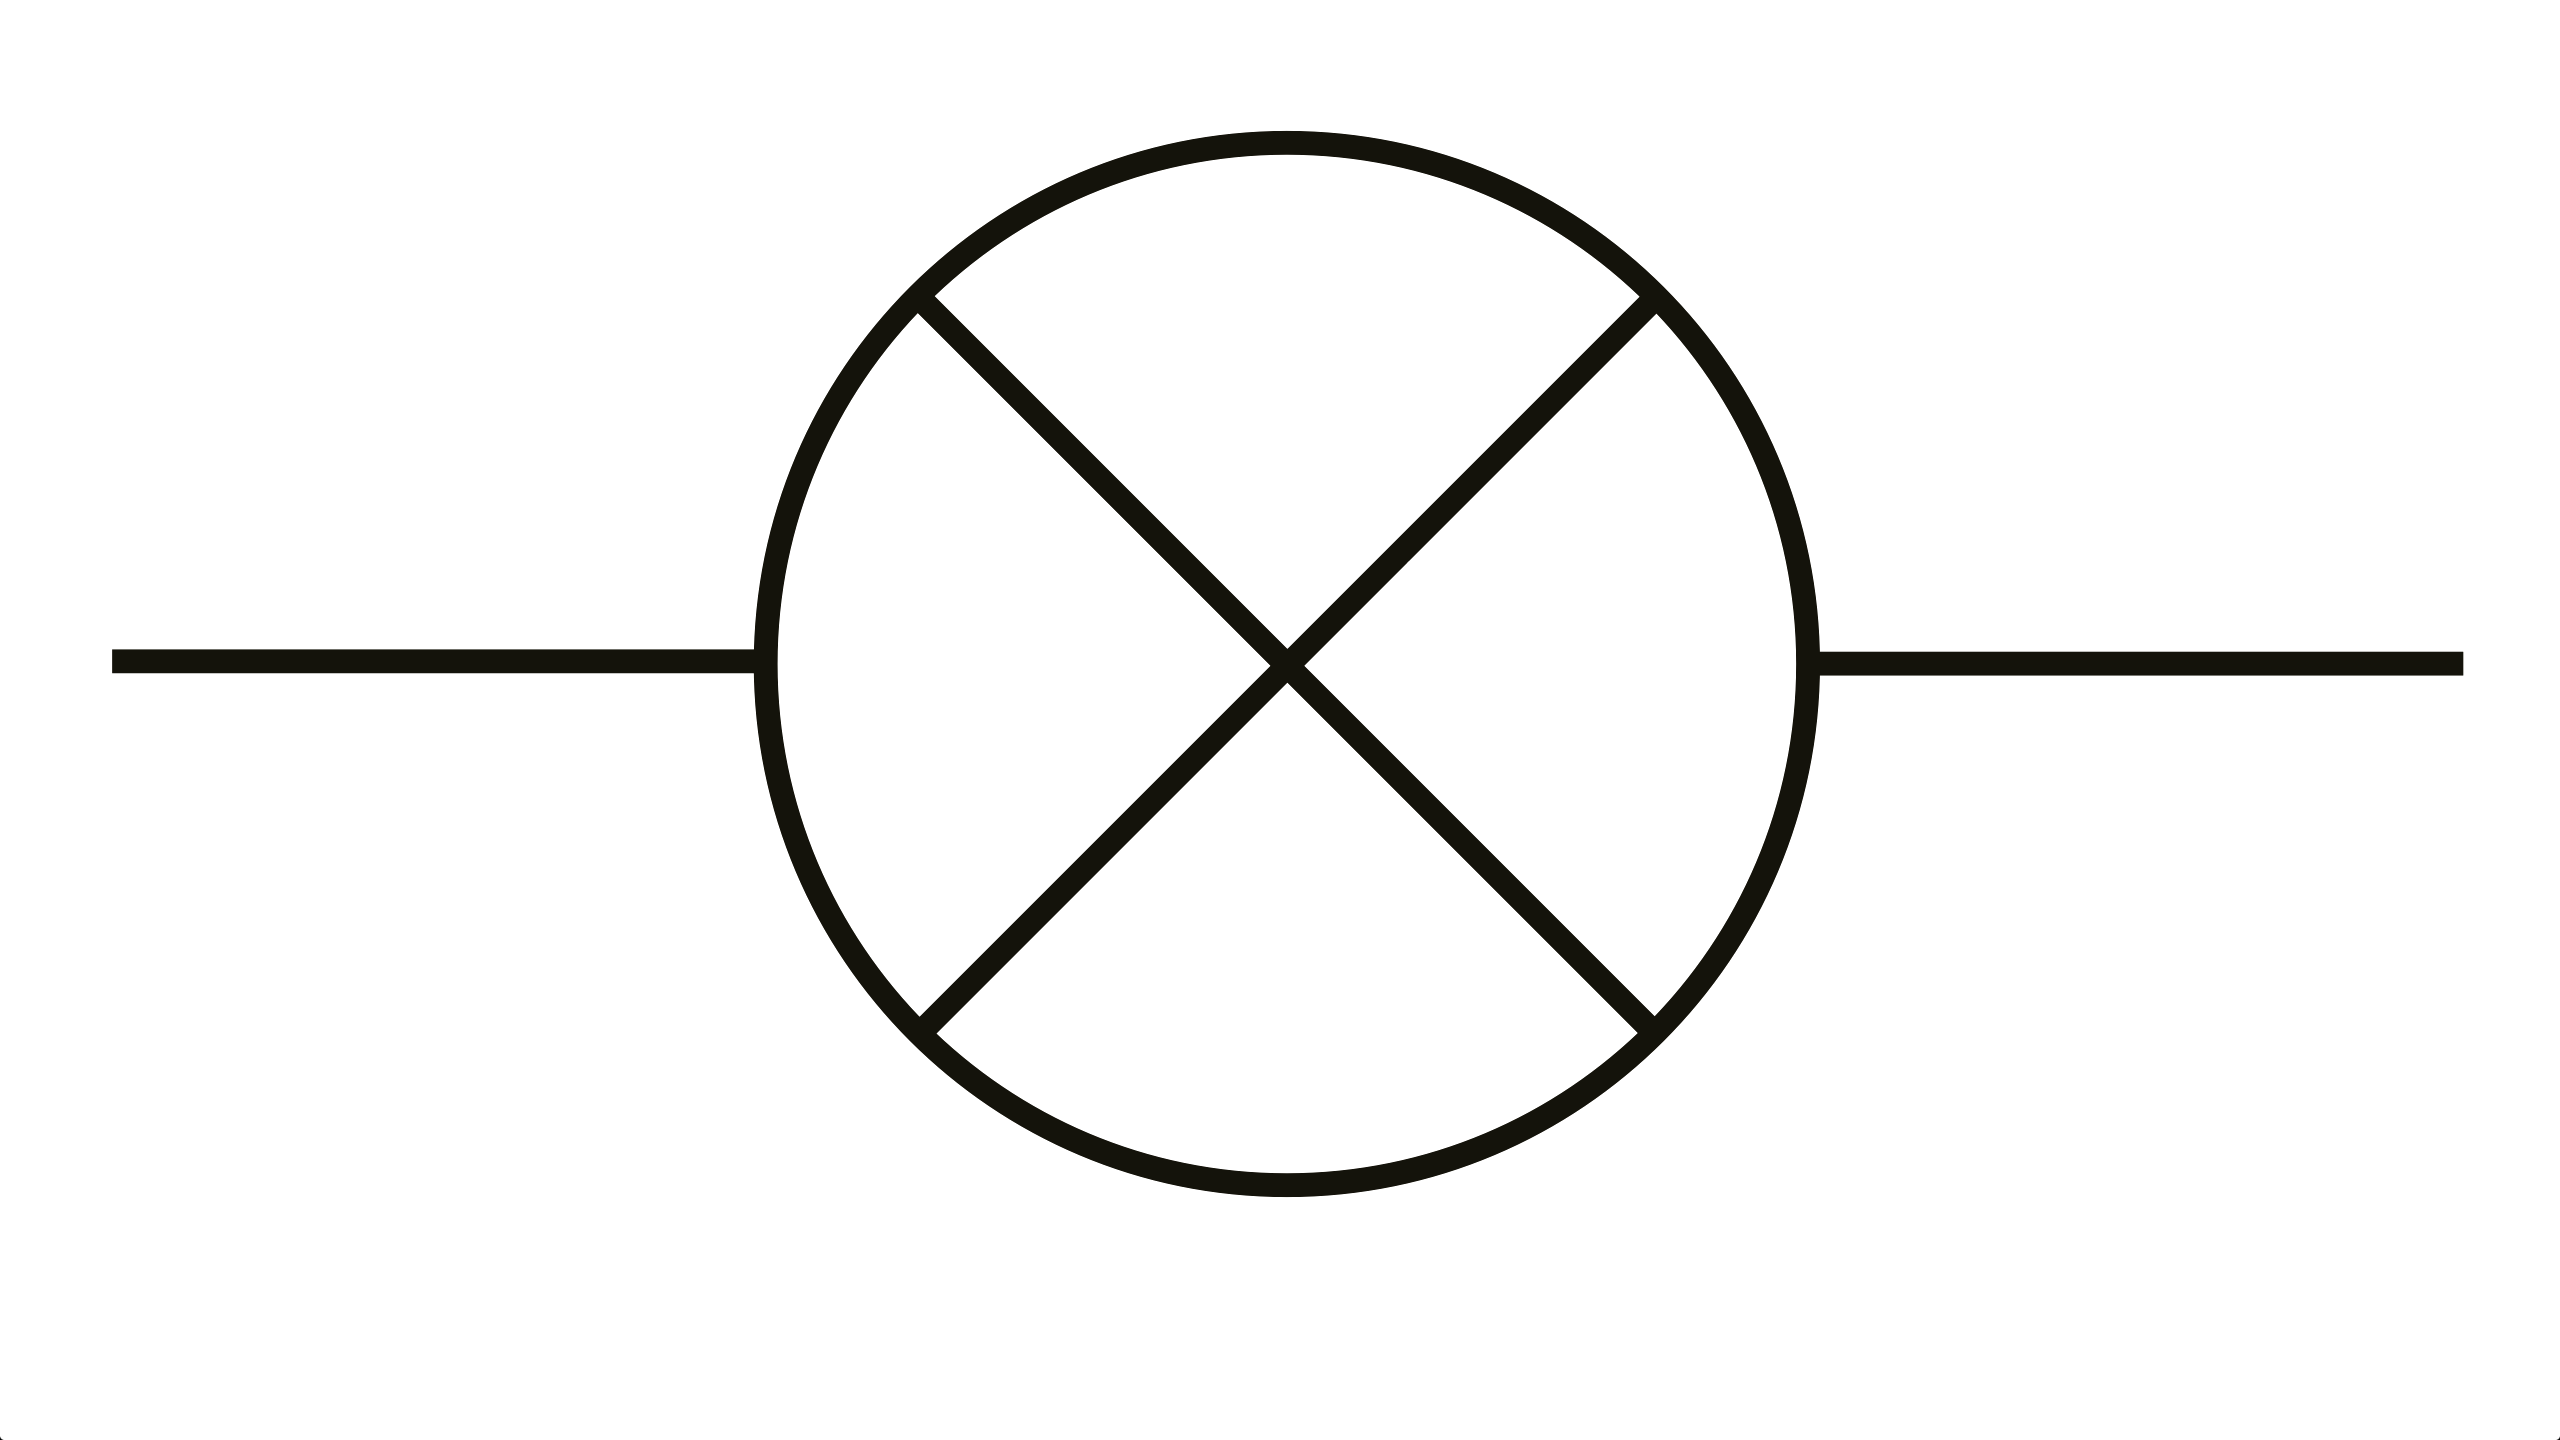 Component Symbol Of Thermistor Potentiometer Symbol